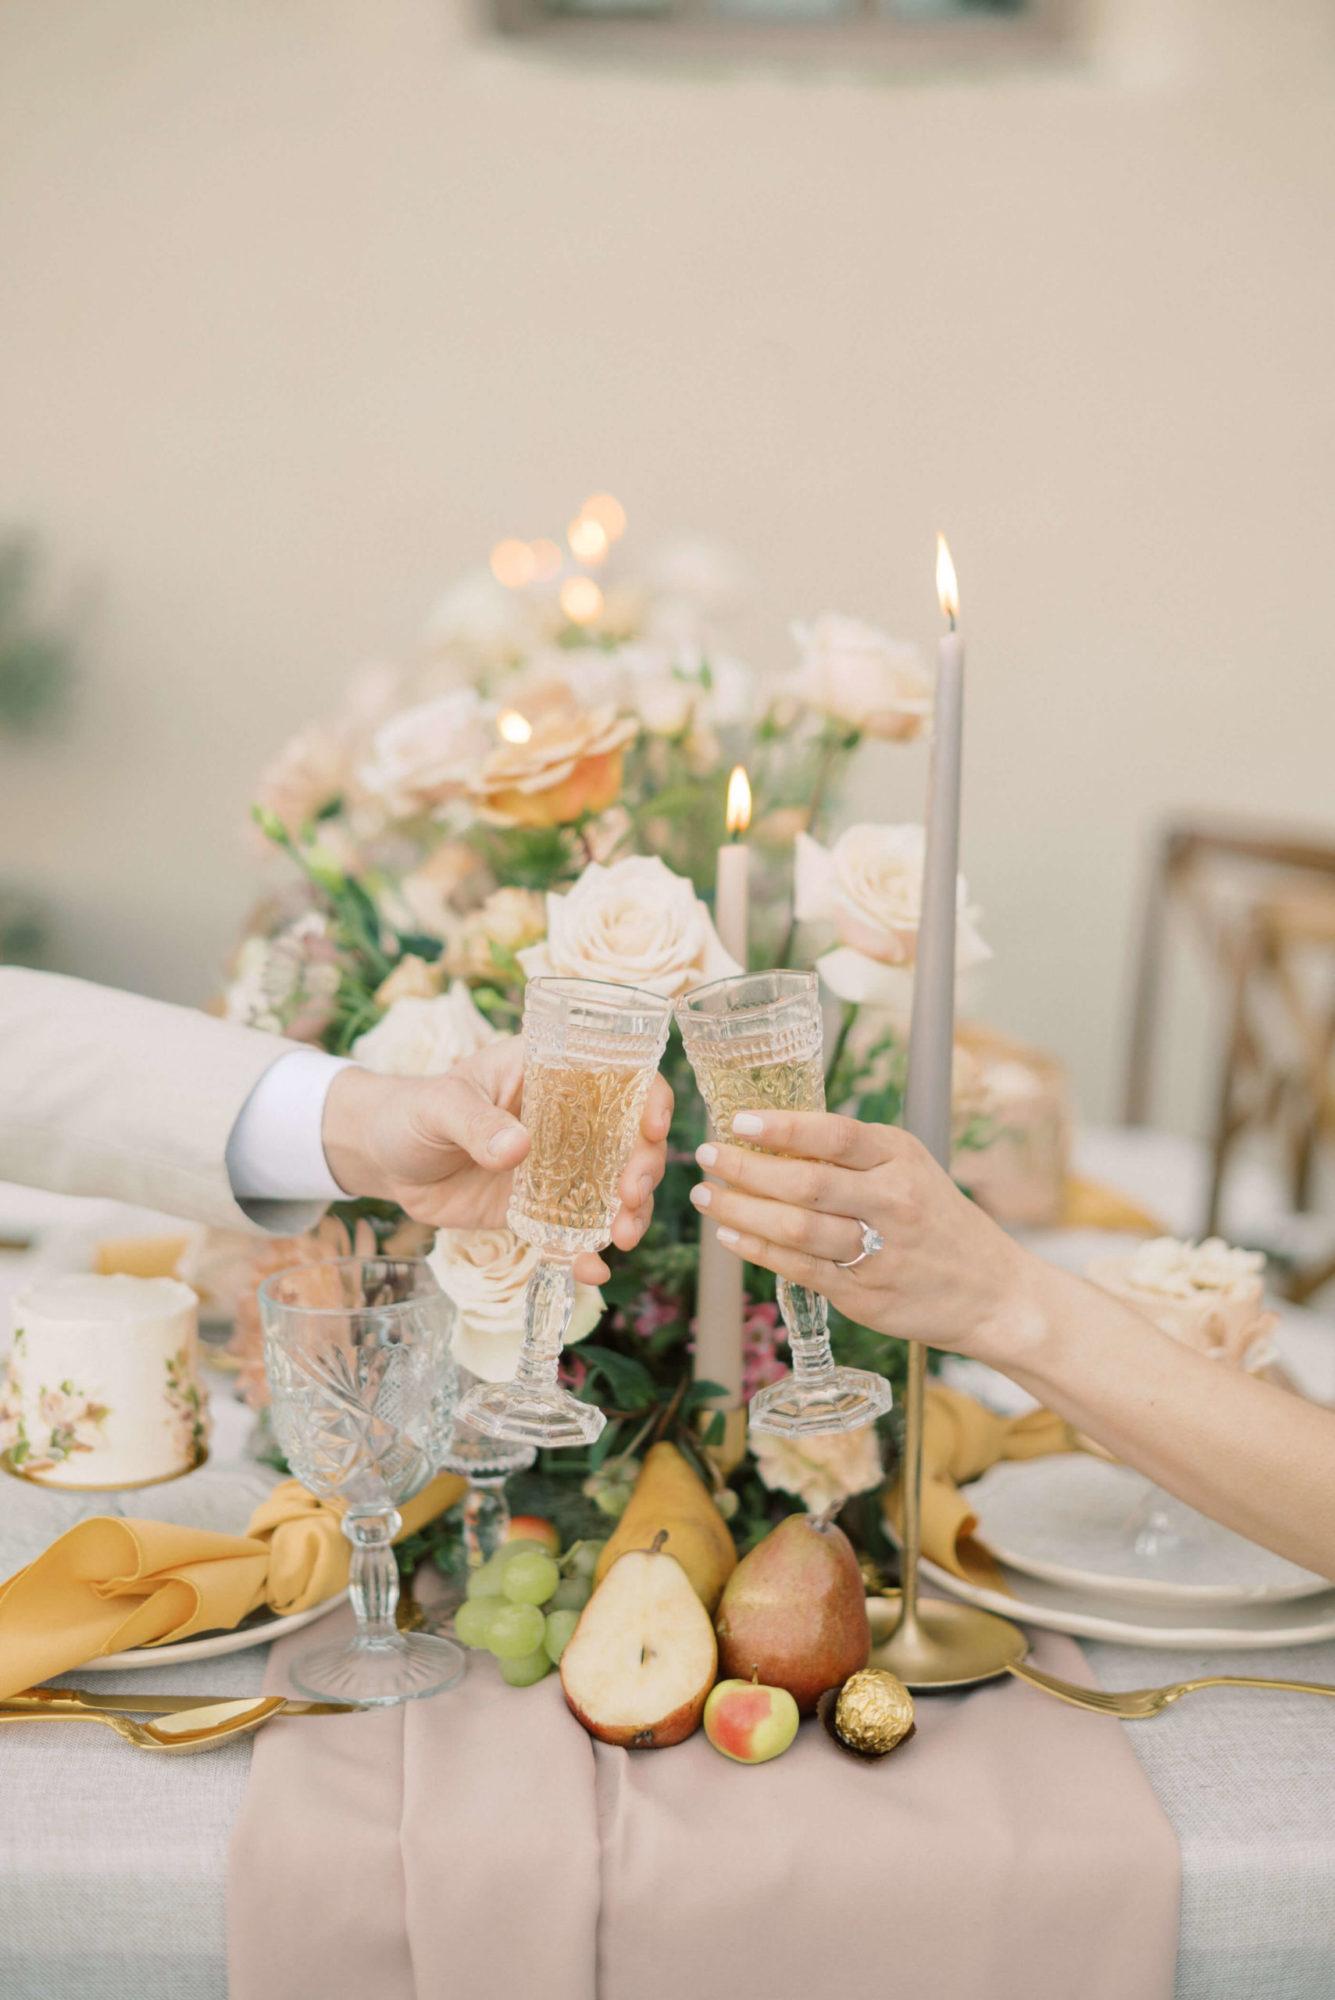 bespoke-destination-wedding-planners-in-southern-california-destination-weddings